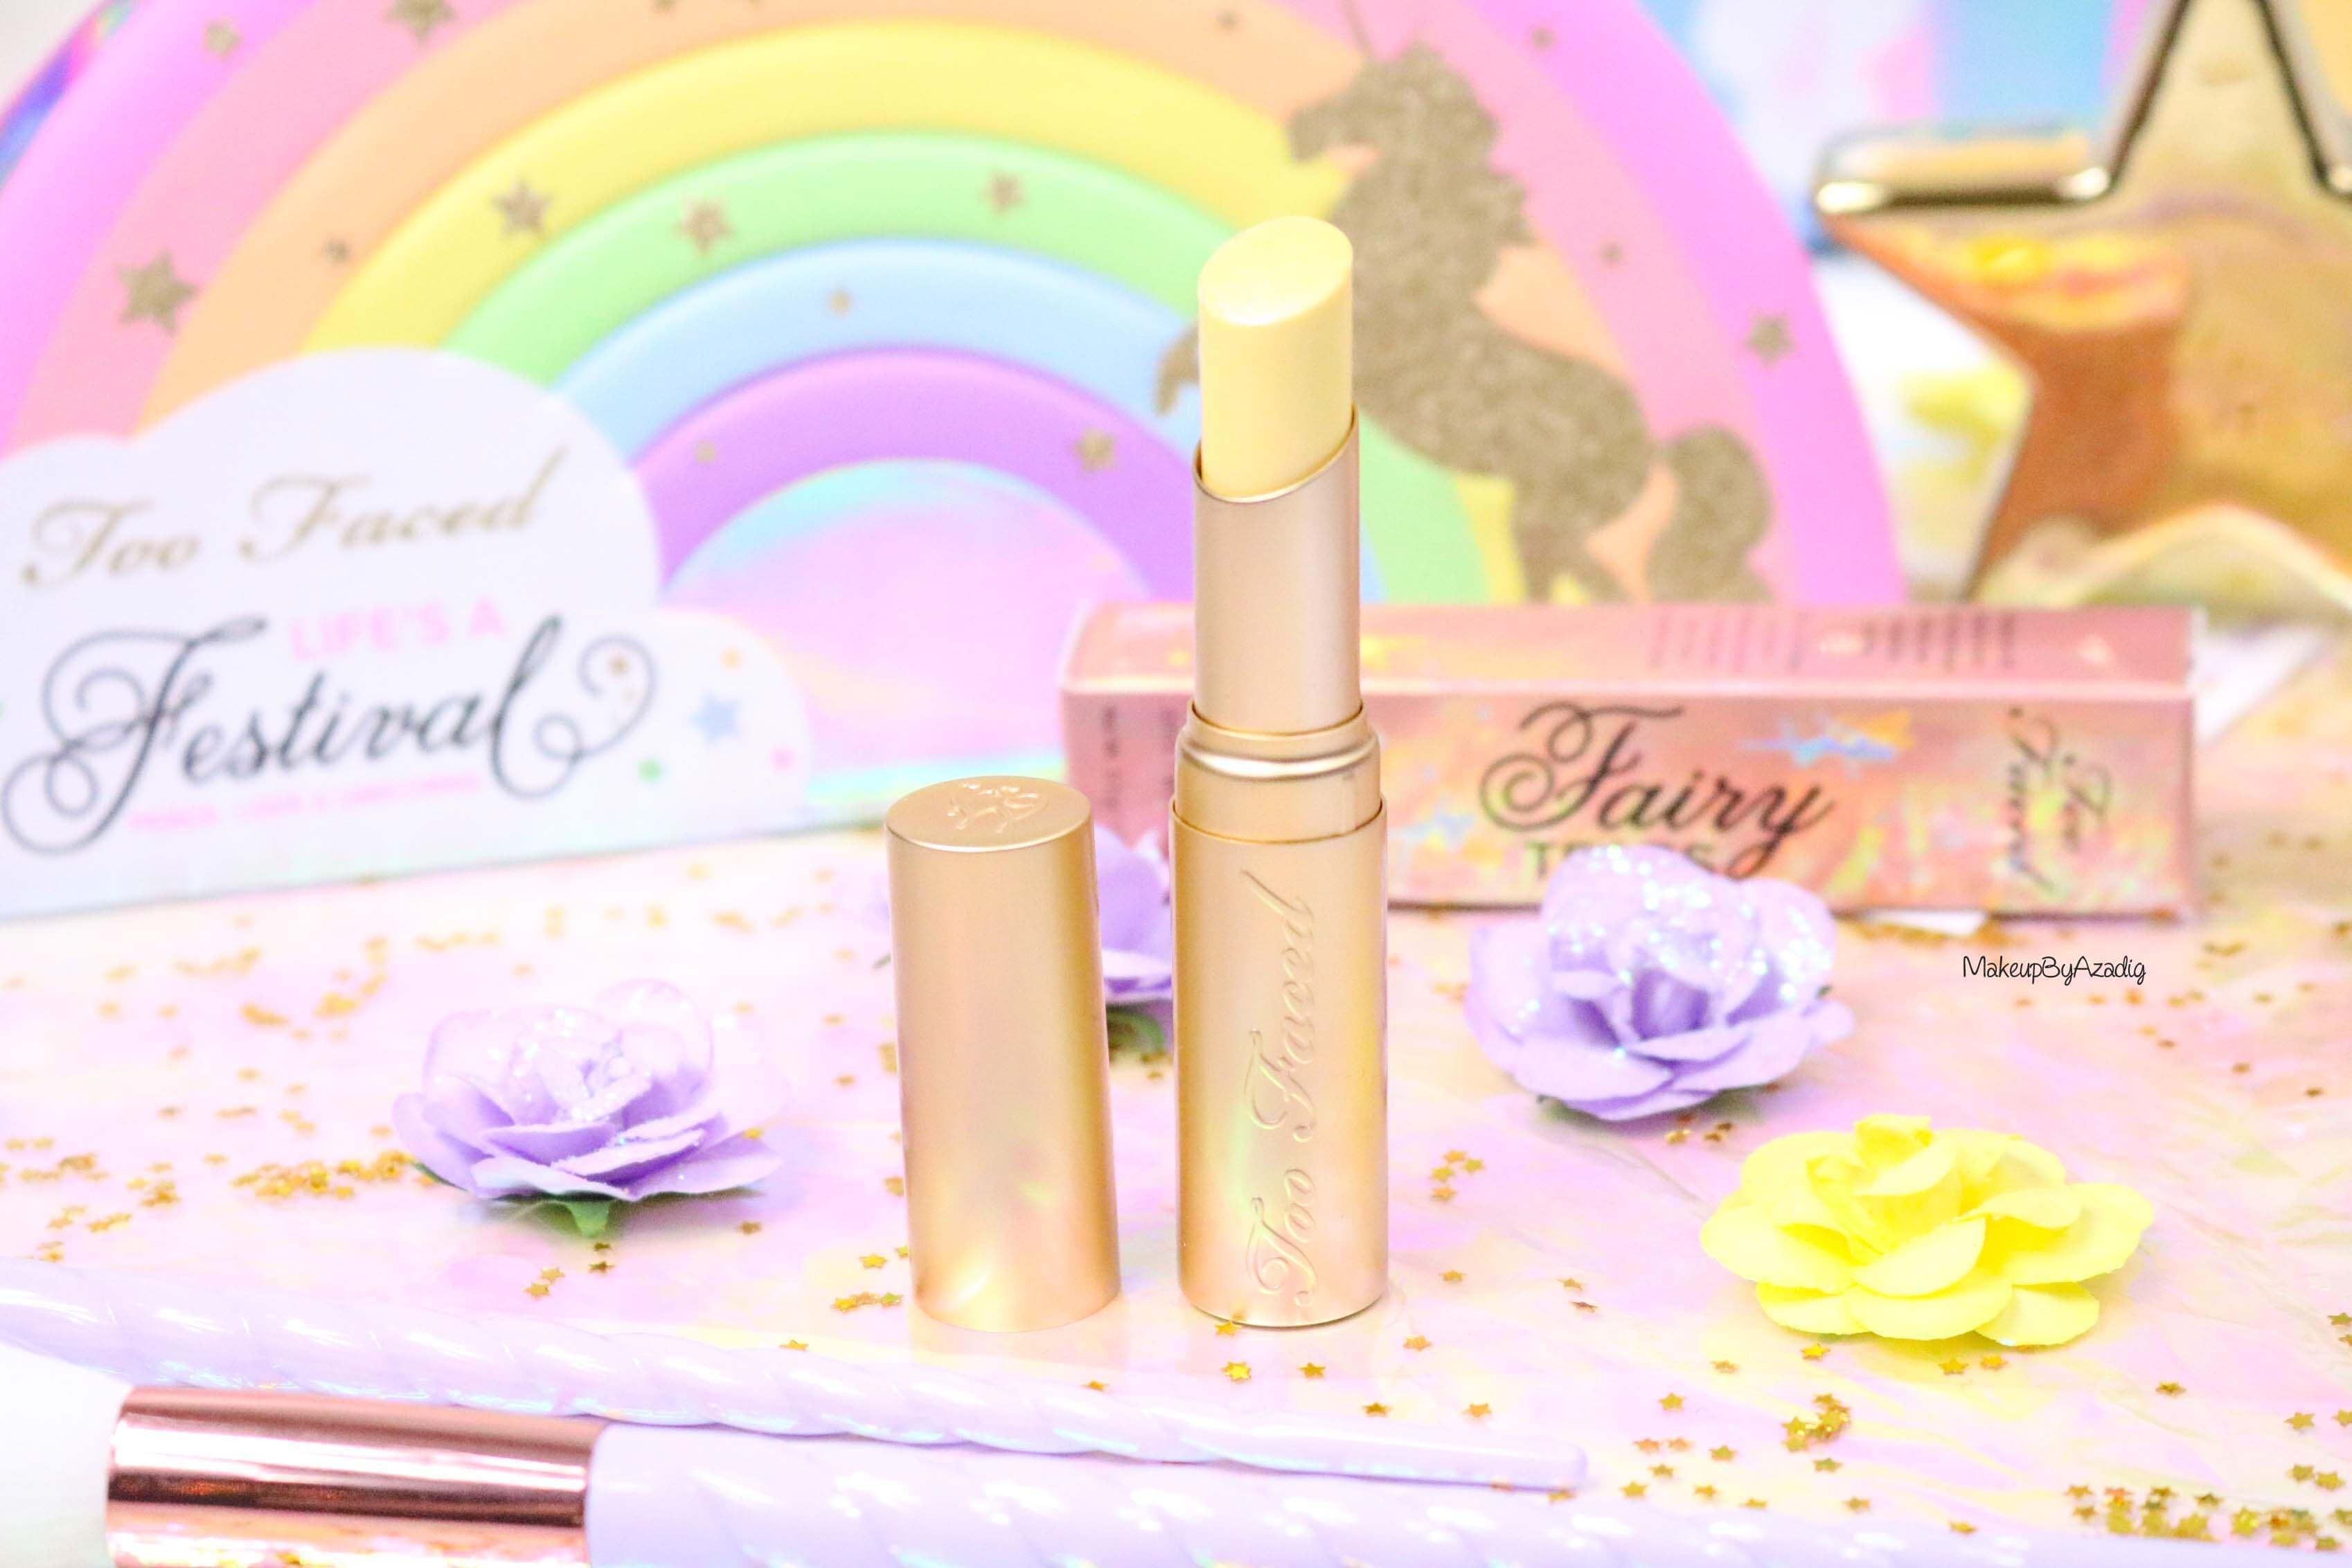 revue-review-mystical-lipstick-rouge-levres-magique-too-faced-avis-swatch-prix-france-makeupbyazadig-miniature